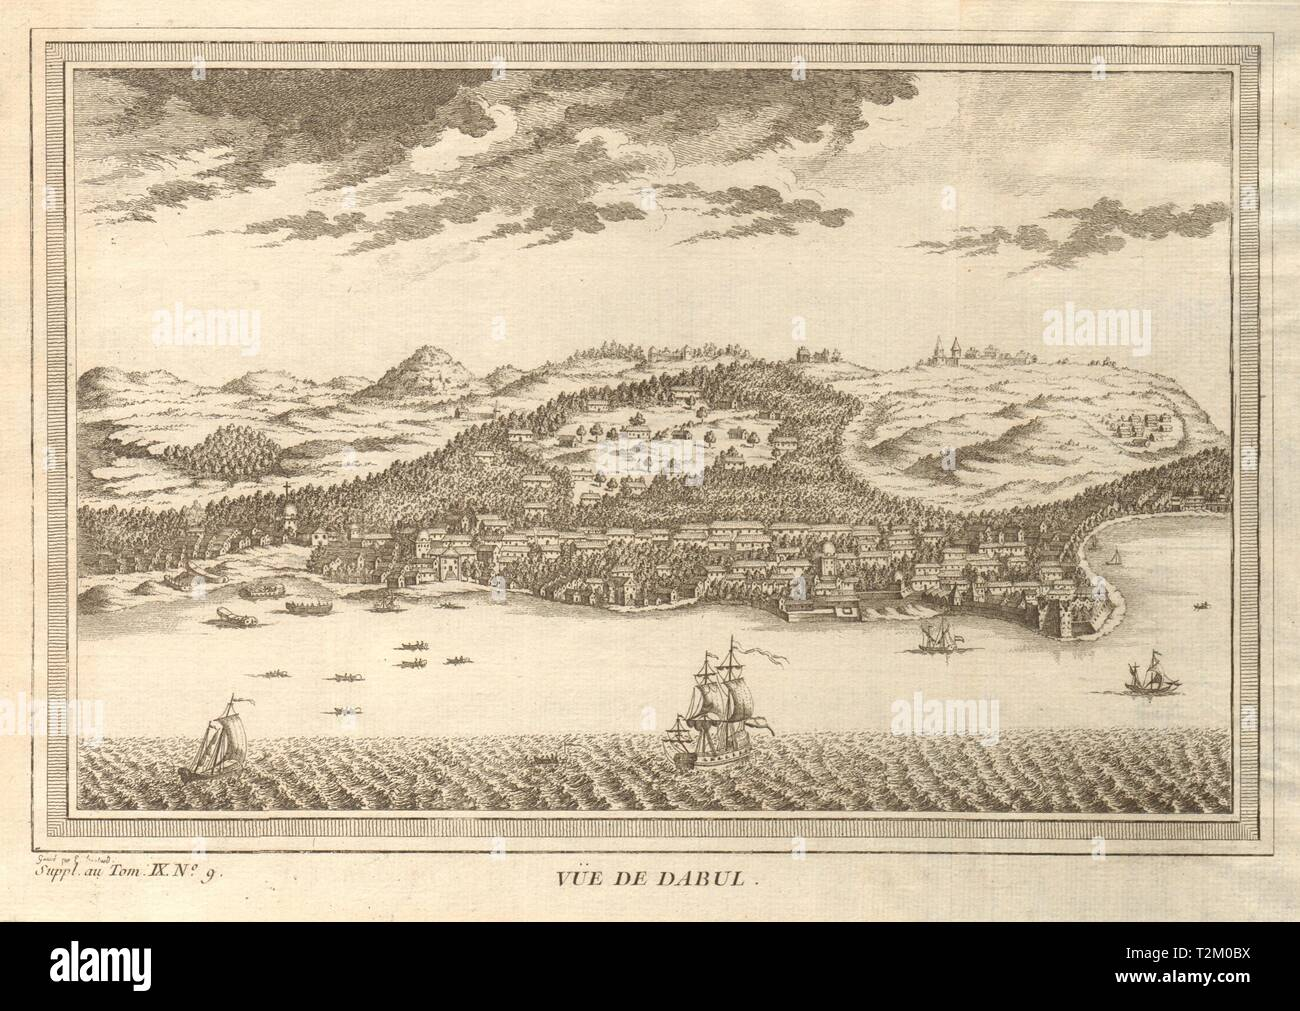 'Vue de Dabul'. View of Dabhol, Ratnagiri district, Maharashtra, India 1761 - Stock Image